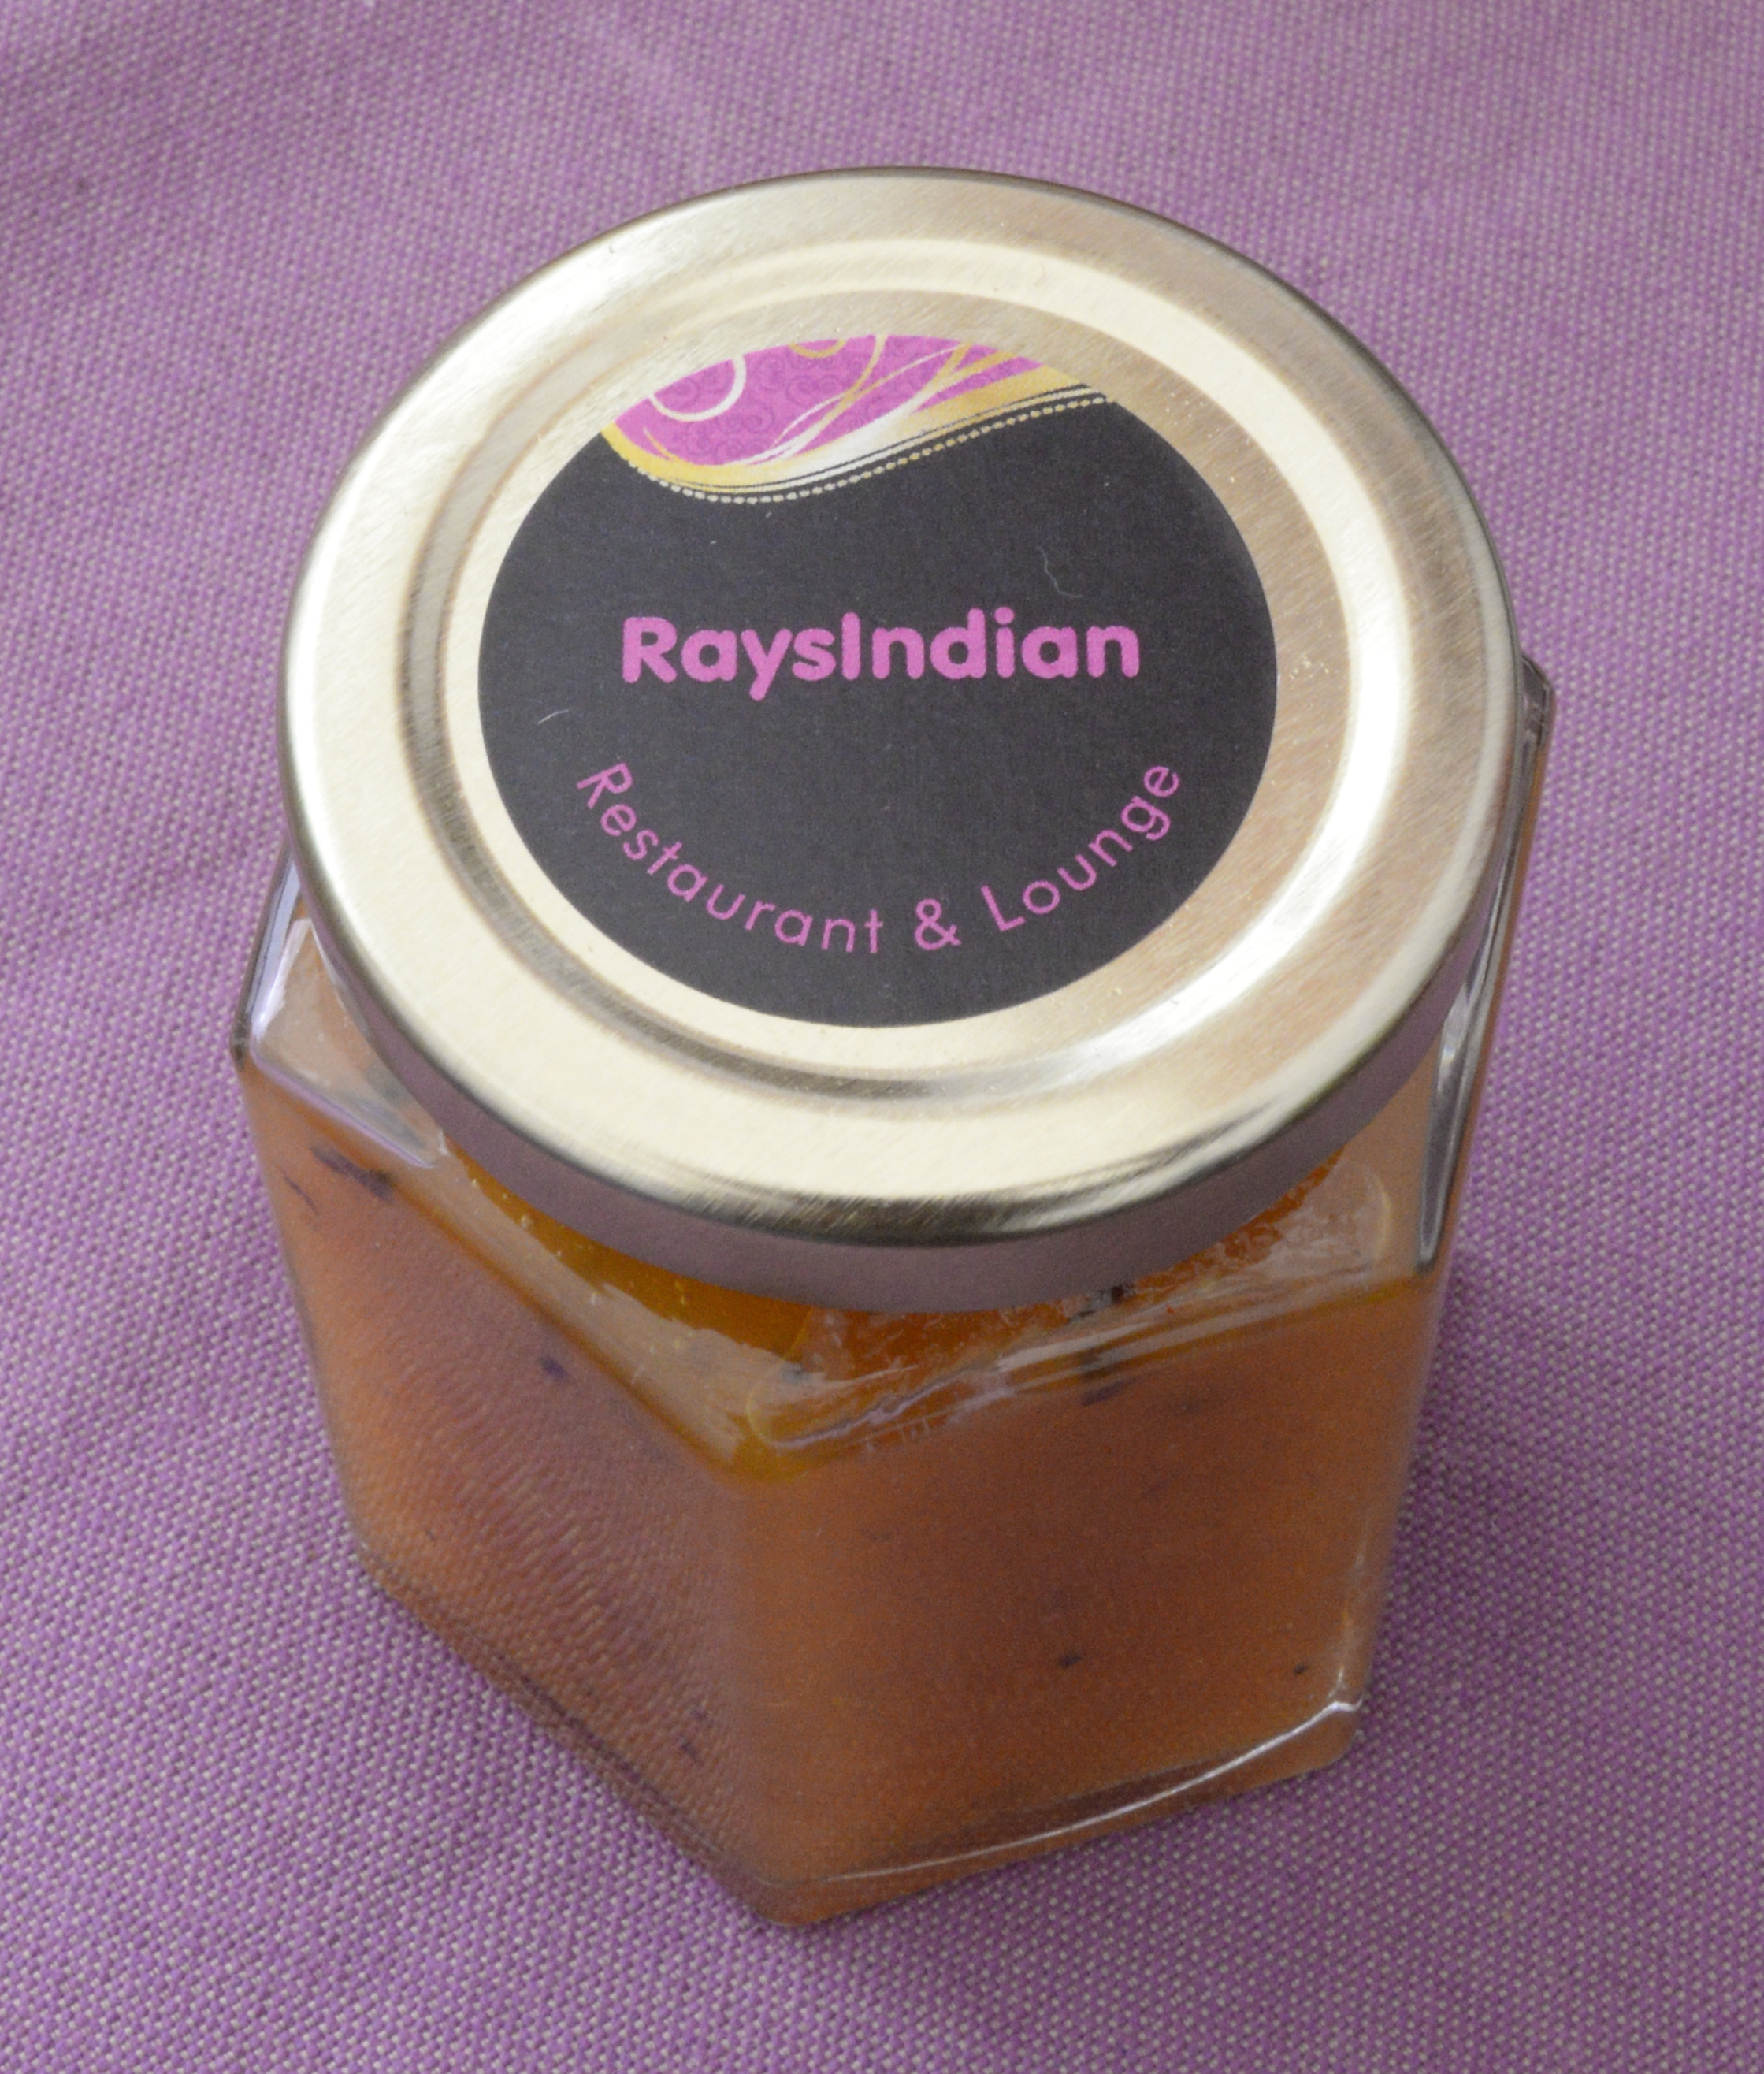 Raysindian